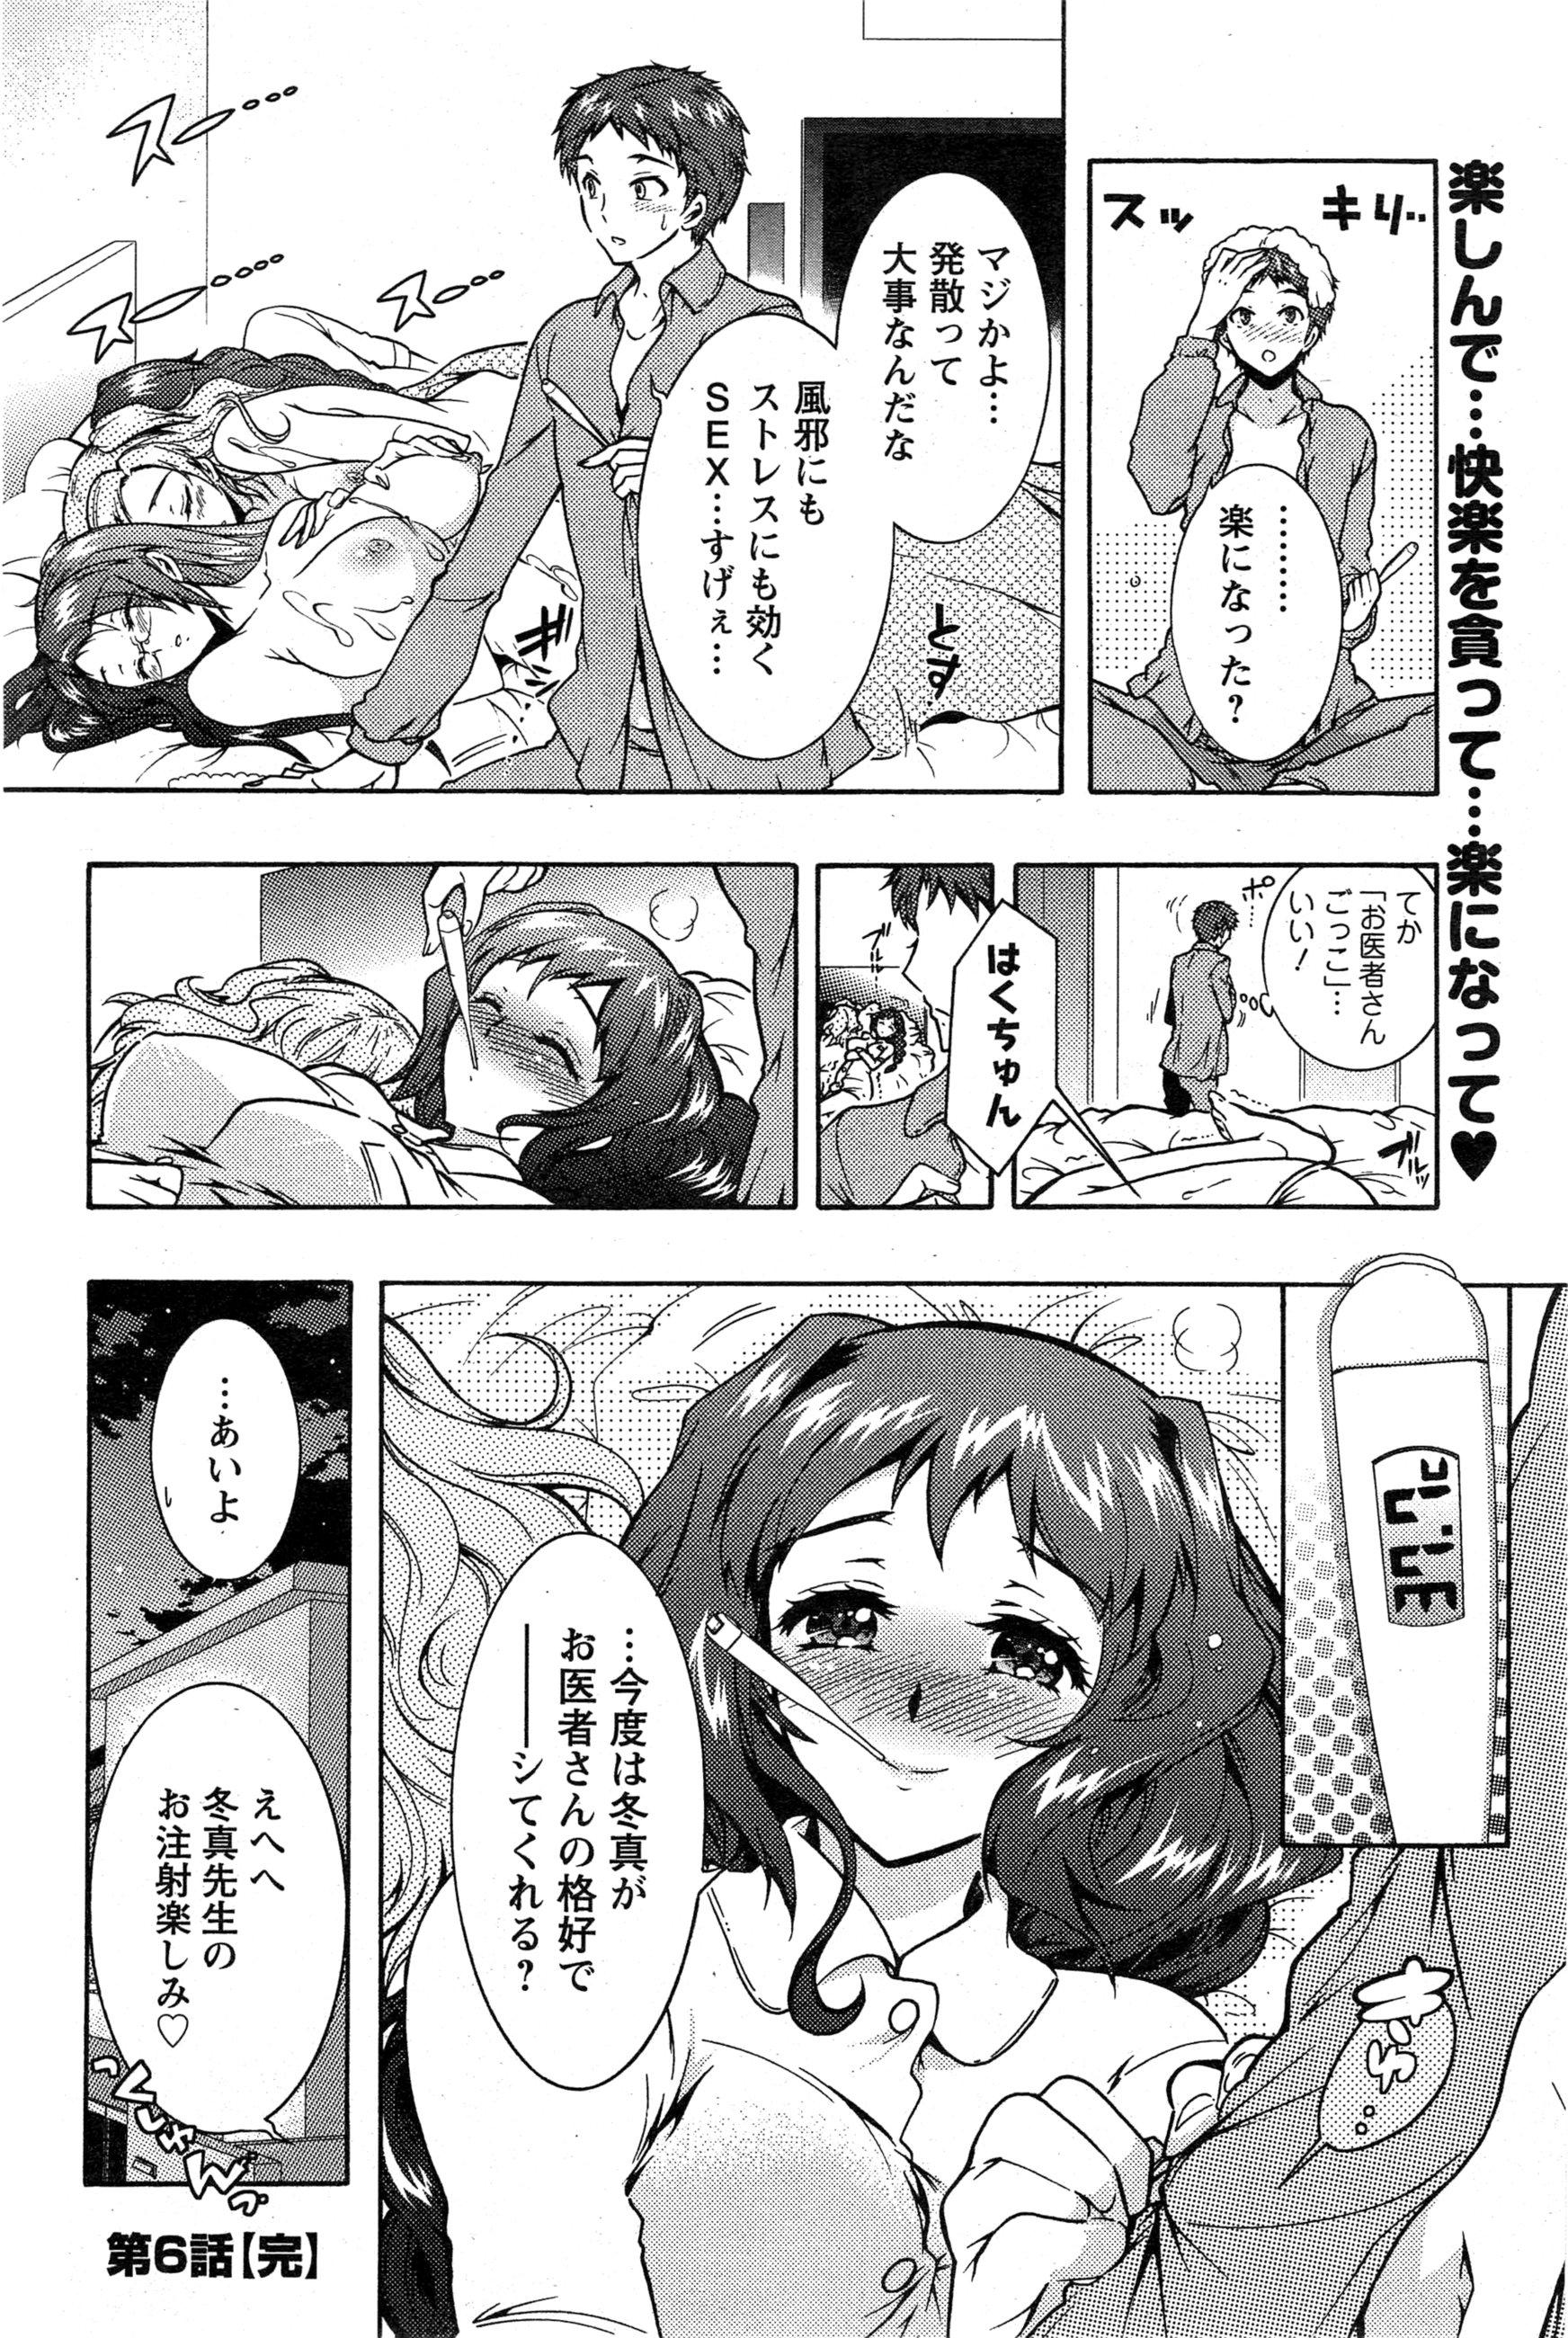 [Honda Arima] Sanshimai no Omocha - The Slave of Three Sisters Ch. 1-6 110